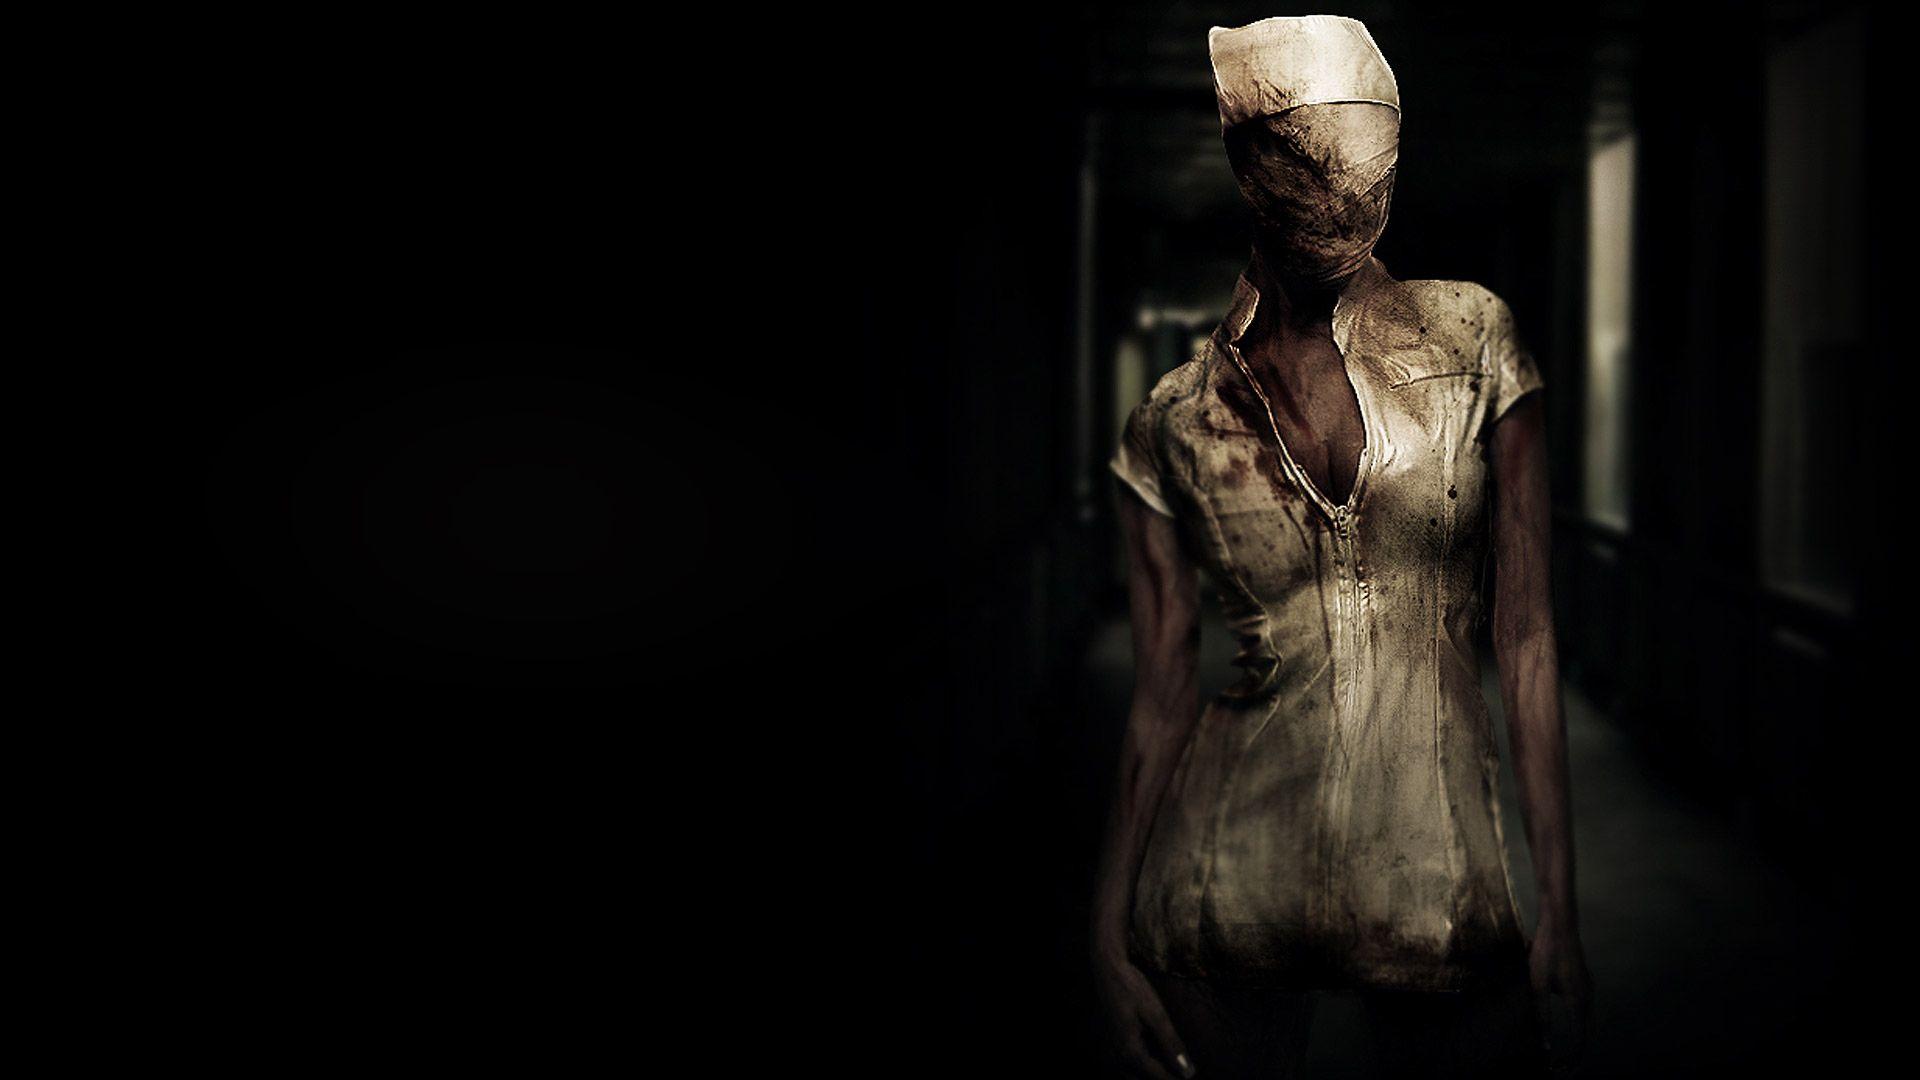 Keytoplay It Horror Wallpapers Hd Silent Hill Silent Hill Art